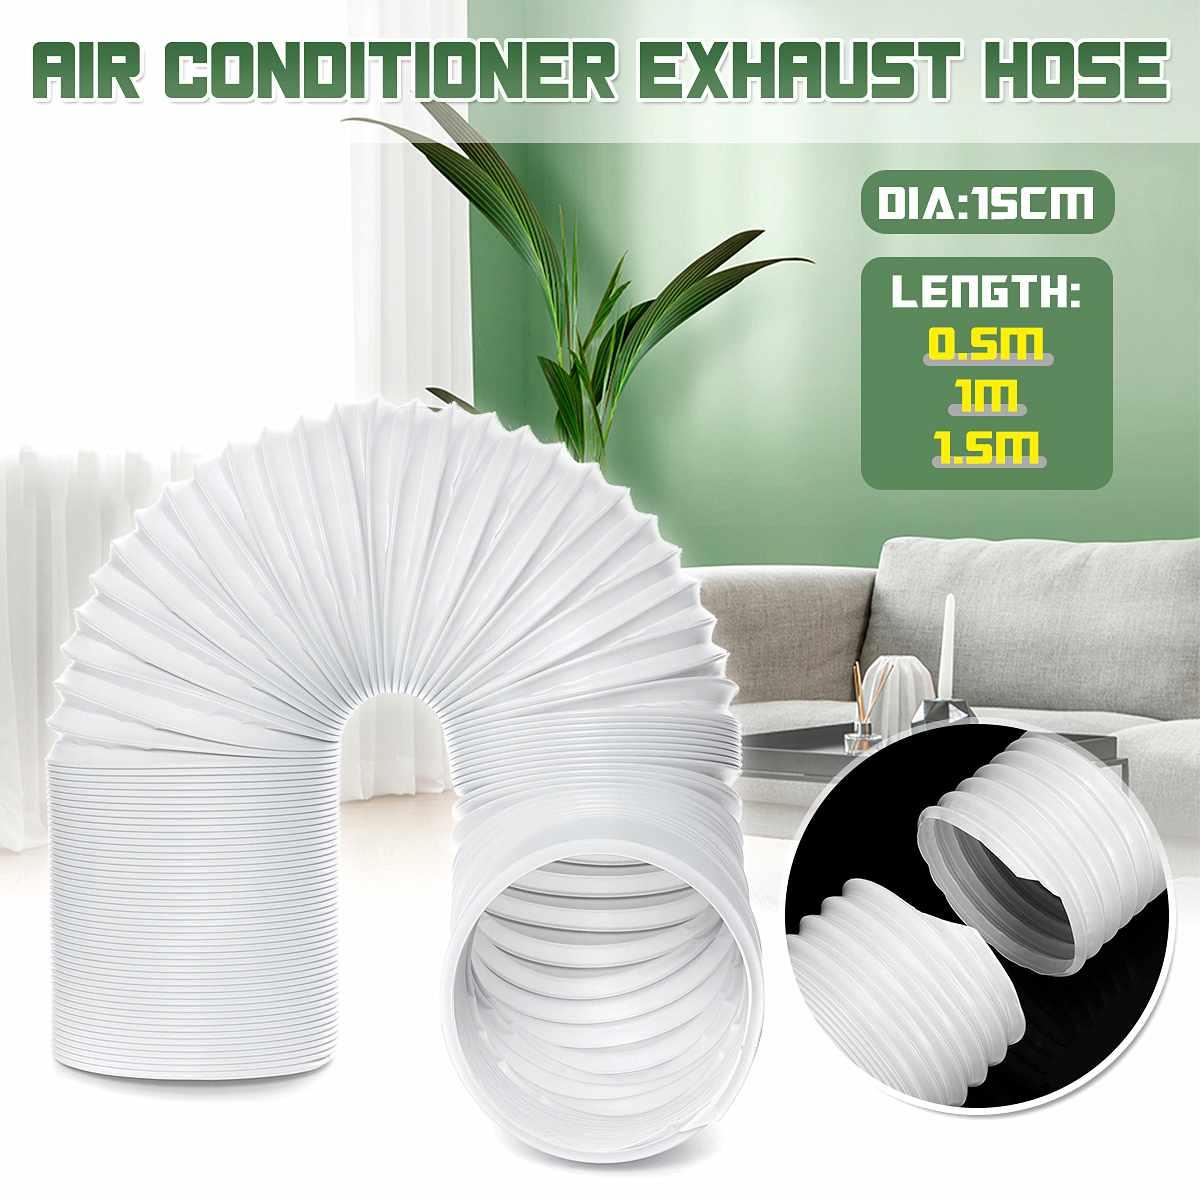 2m/3m/4m Flexible Air Conditioner Exhaust Hose Vent Tube Pipe 150mm Diameter Duct Extension Pipe Air Conditioner Accessories